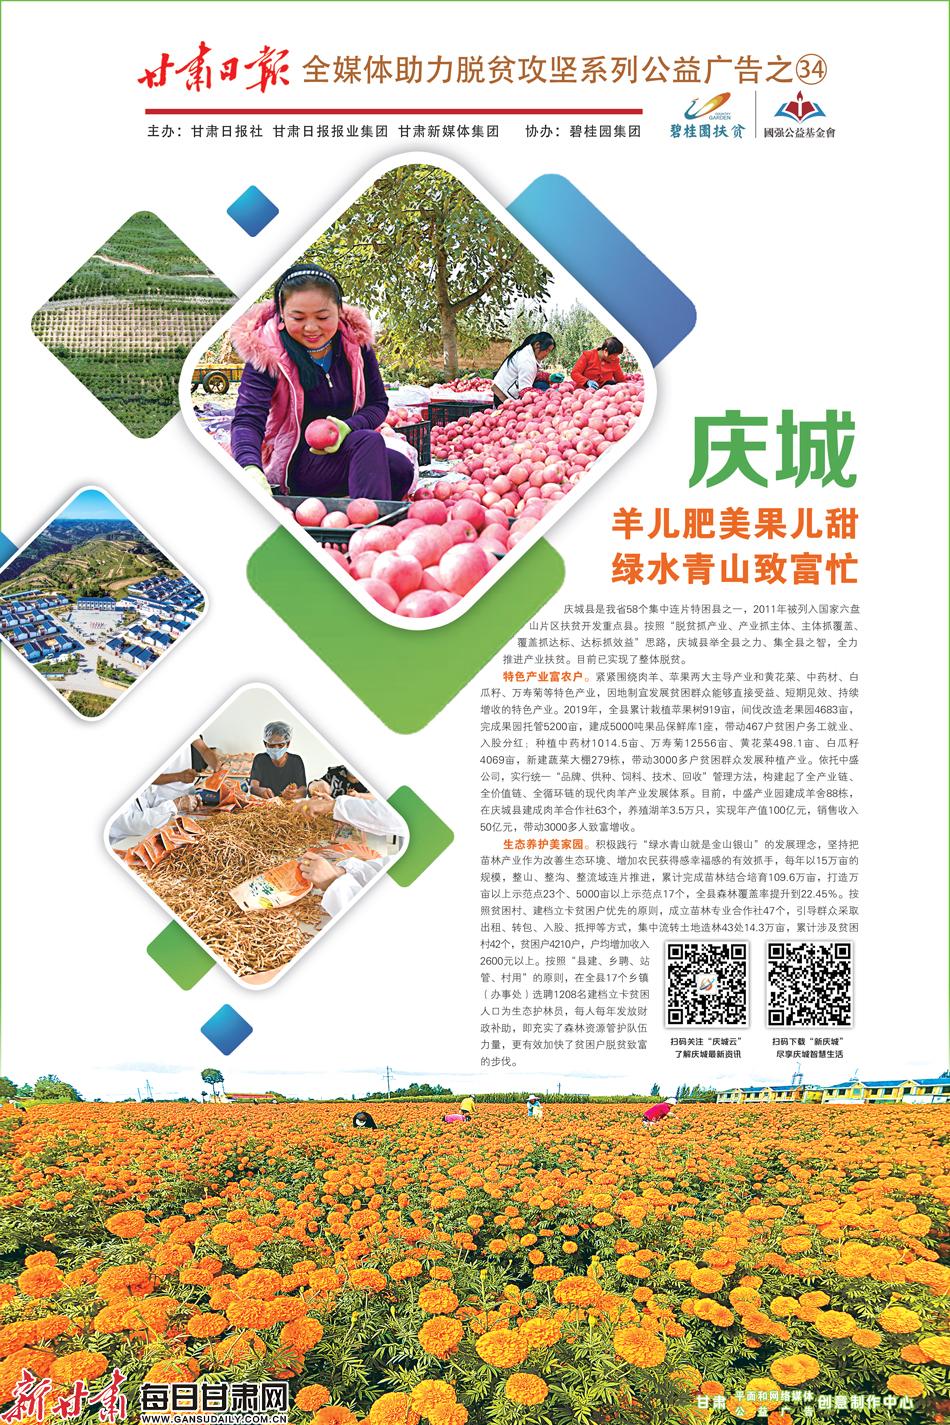 http://pic.gansudaily.com.cn/003/005/417/00300541714_f786d085.jpg